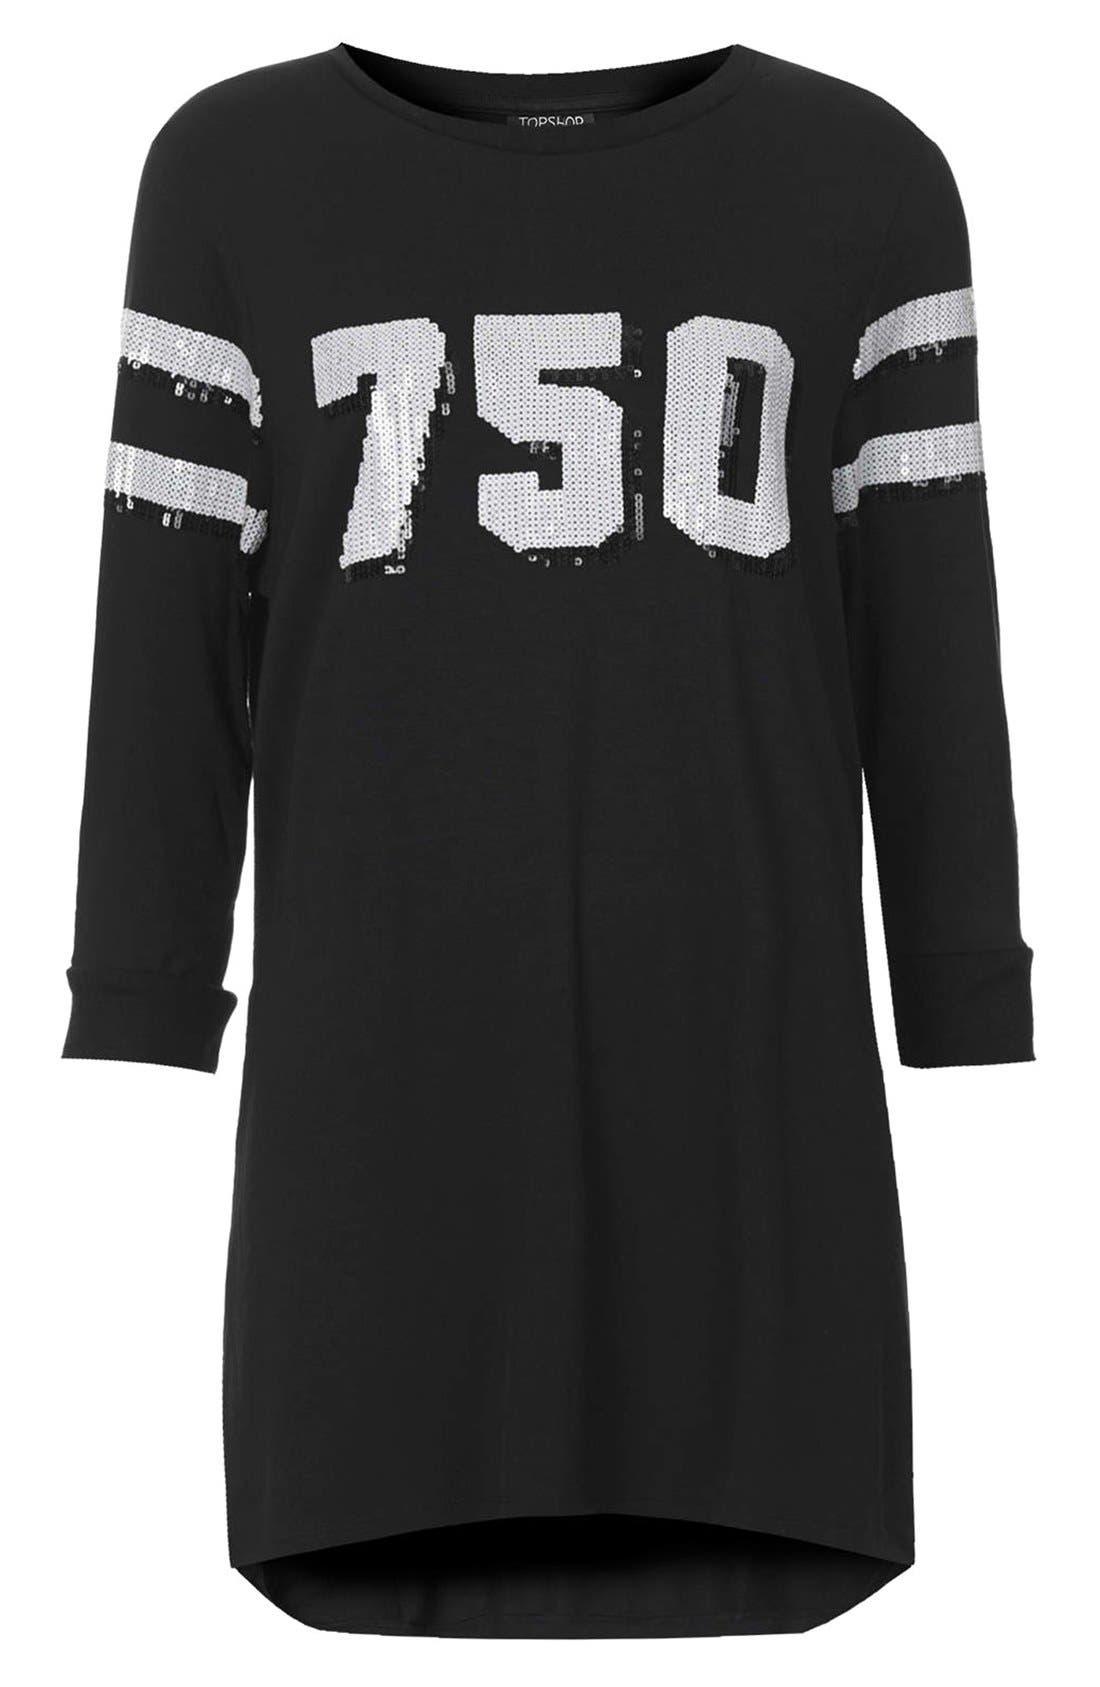 TOPSHOP,                             '750' Sequin Tunic,                             Alternate thumbnail 2, color,                             001